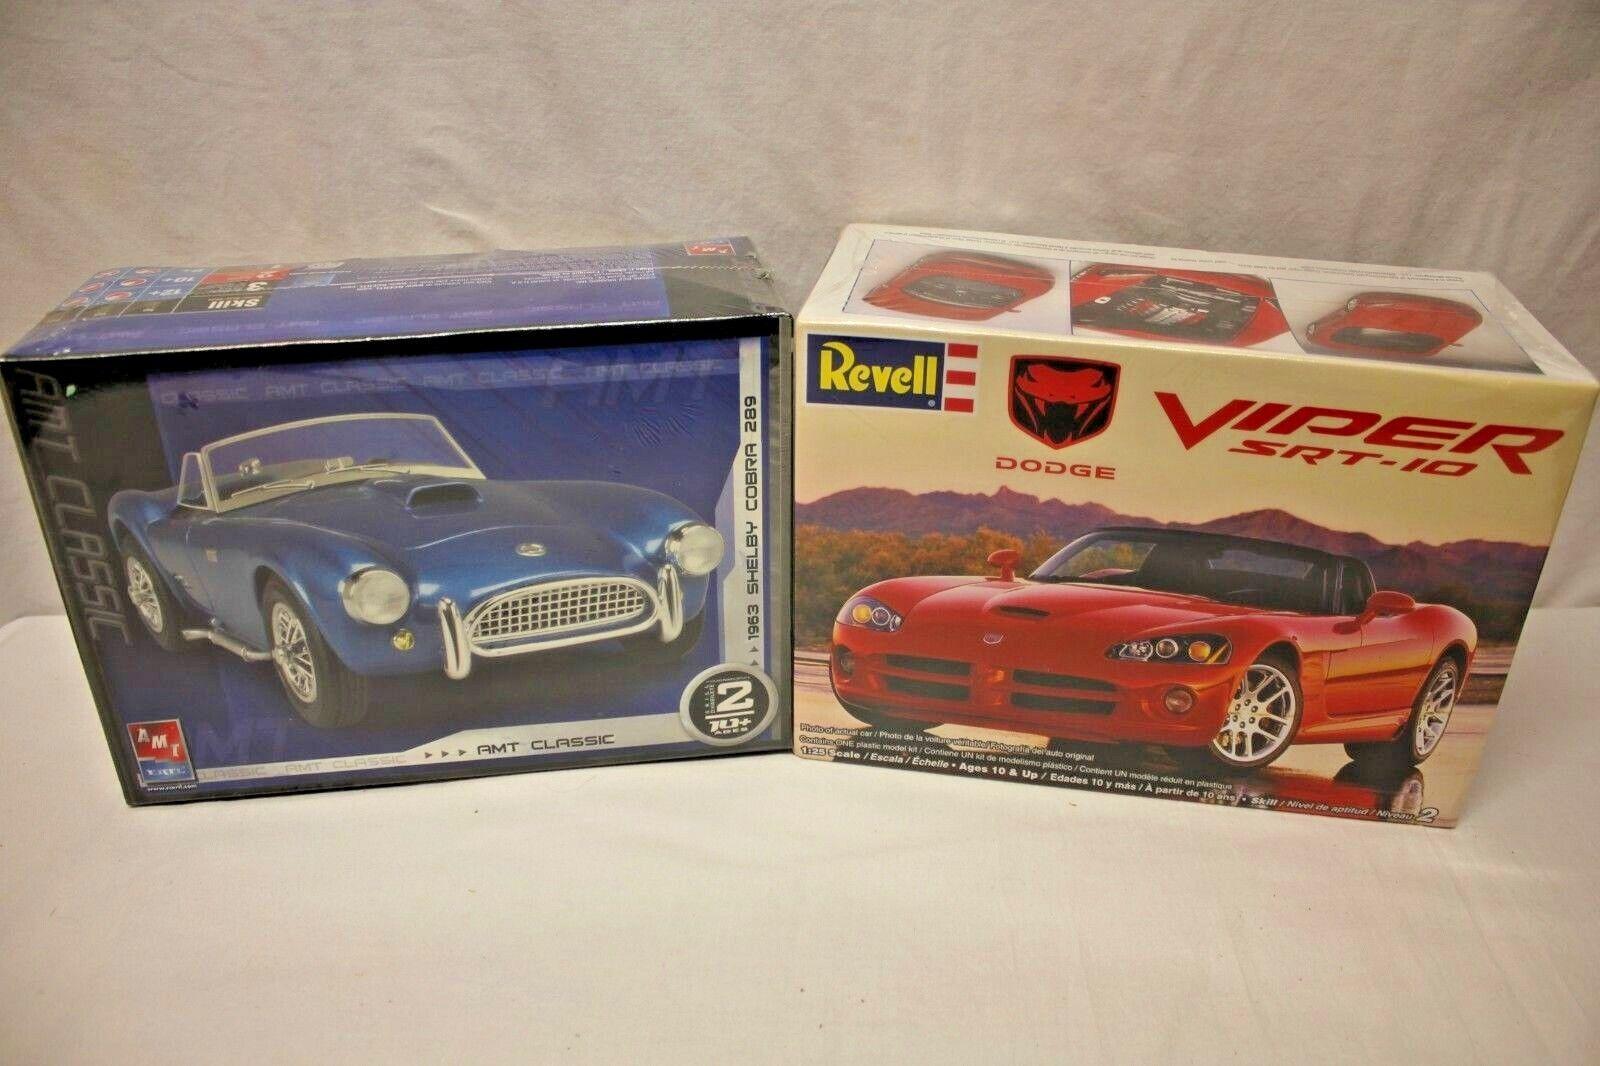 1963 Shelby Cobra 289 AMT ERTL and Dodge Viper SRT10 ACR Revell 1 25 MODEL KITS